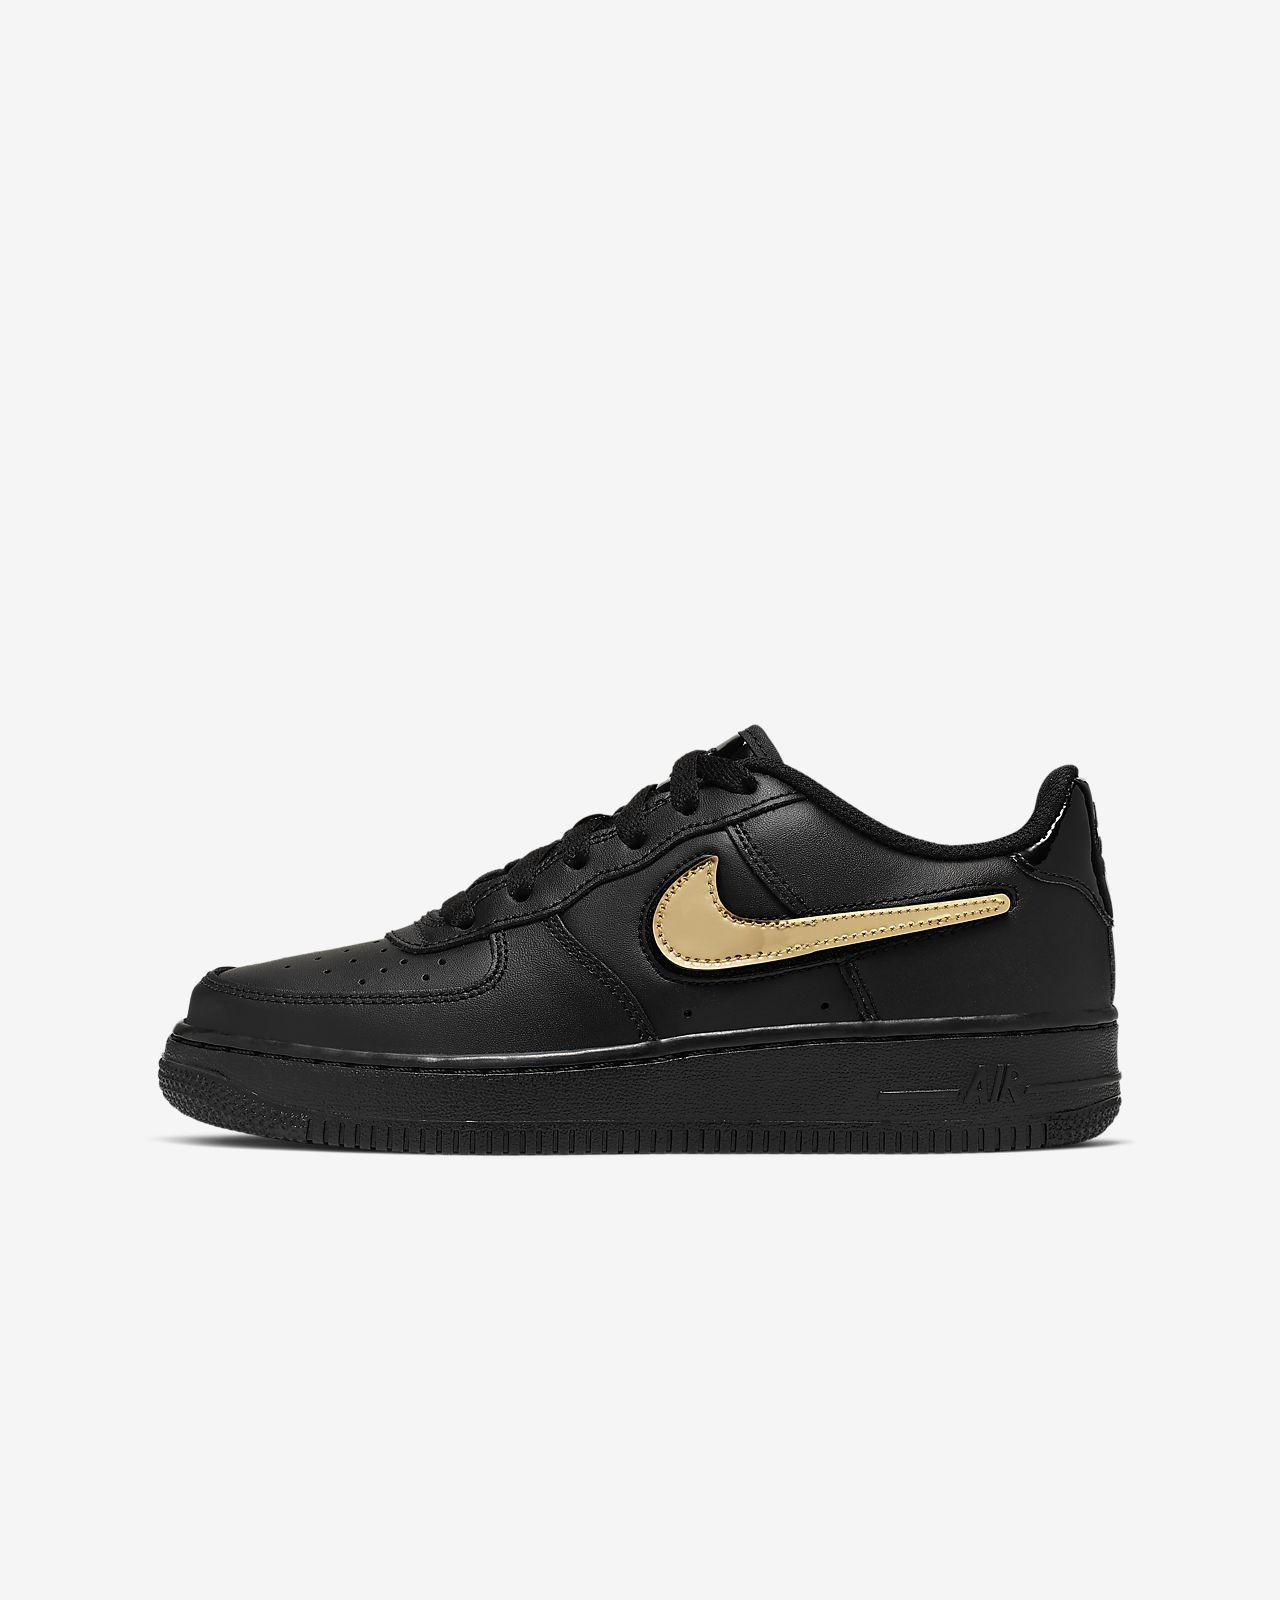 Nike Air Force 1 LV8 3 Schuh für ältere Kinder